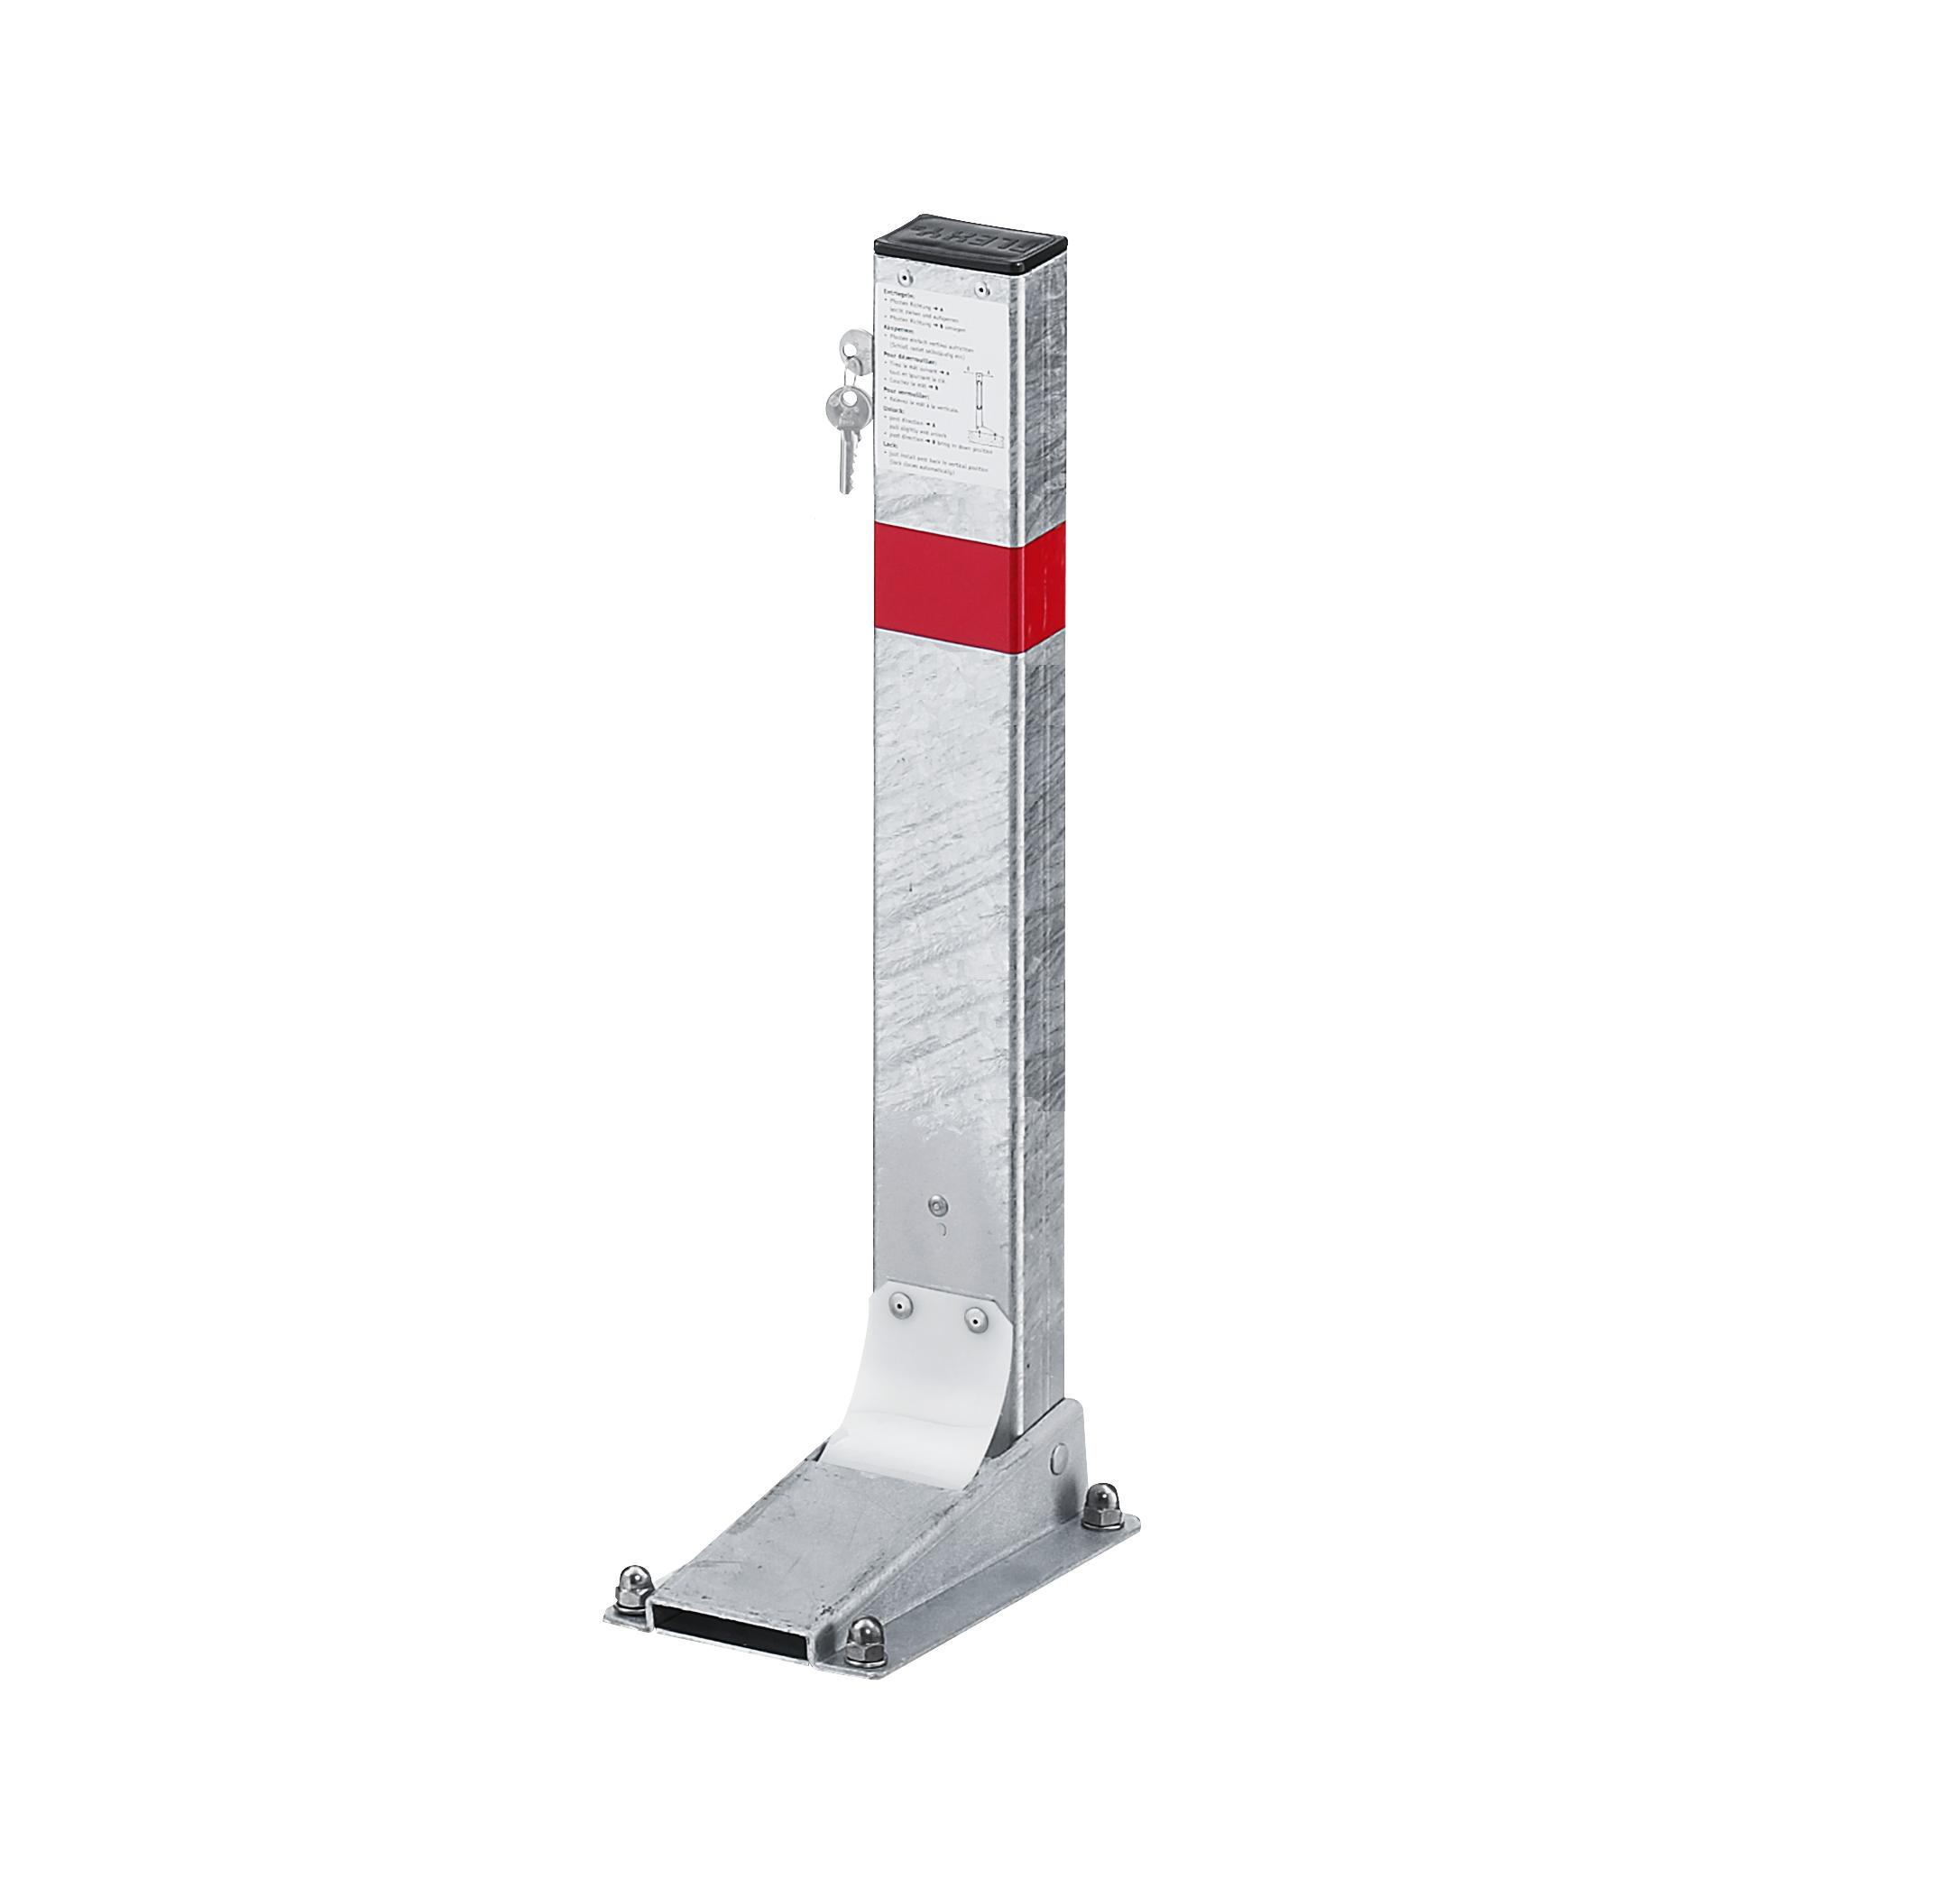 Sperrbügel flexibel   40 x 80 mm x 600 mm